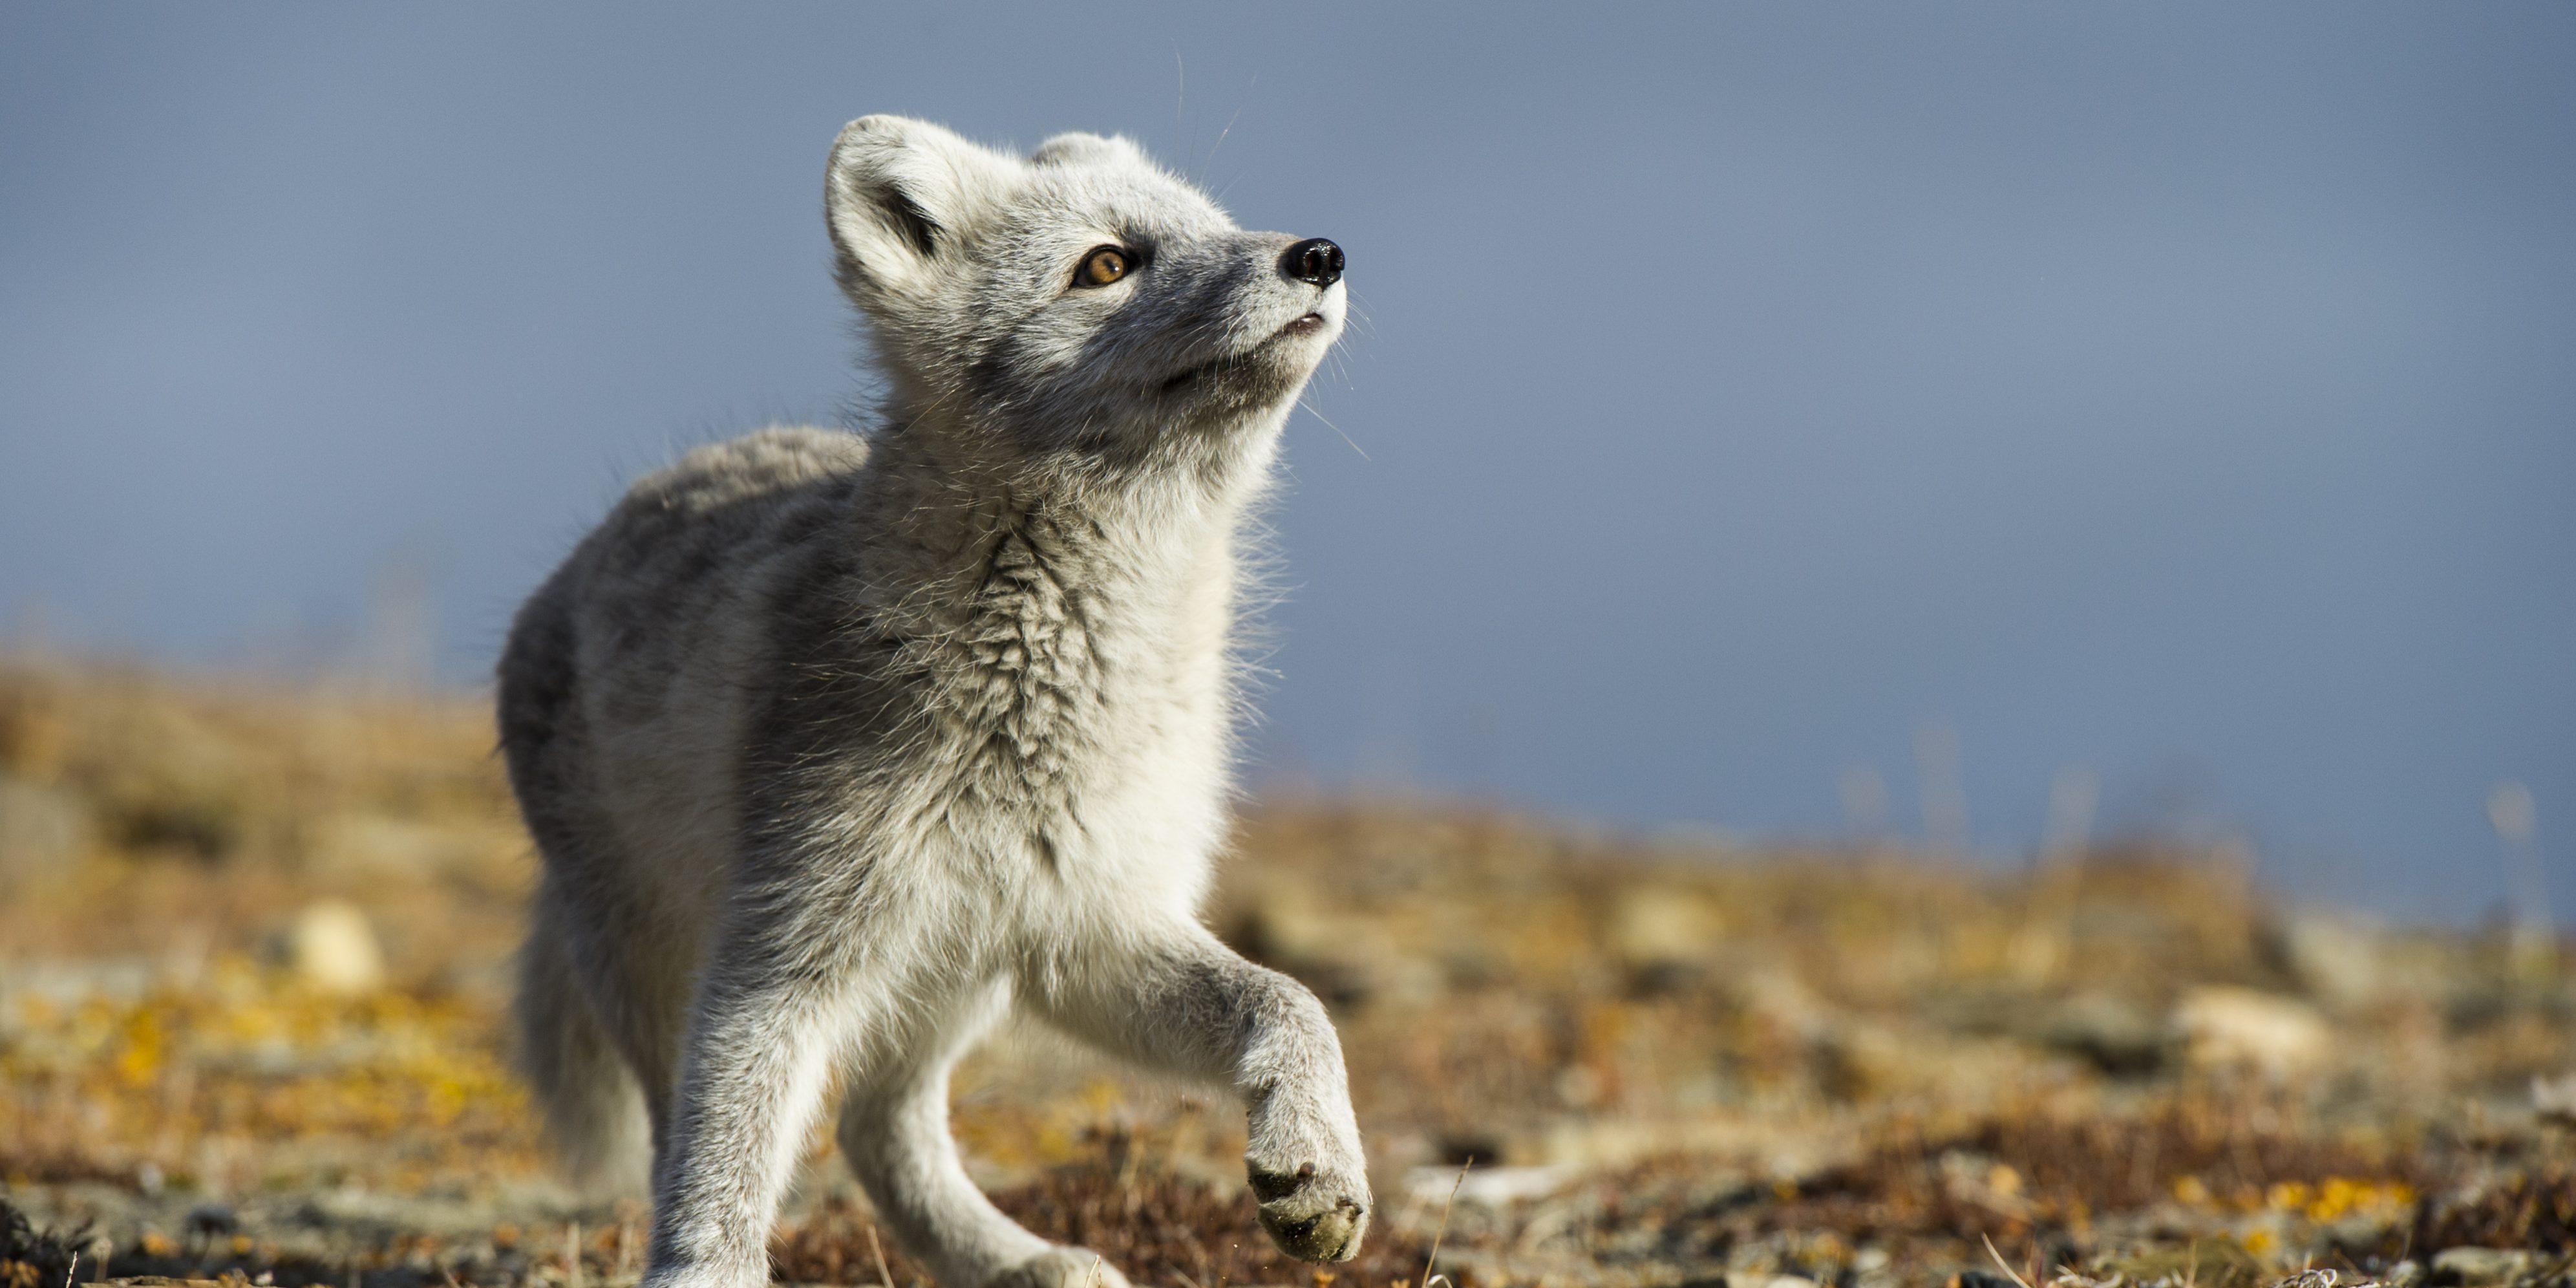 005381_Roy Mangersnes - wildphoto.no_www.nordnorge.com_Longyearbyen